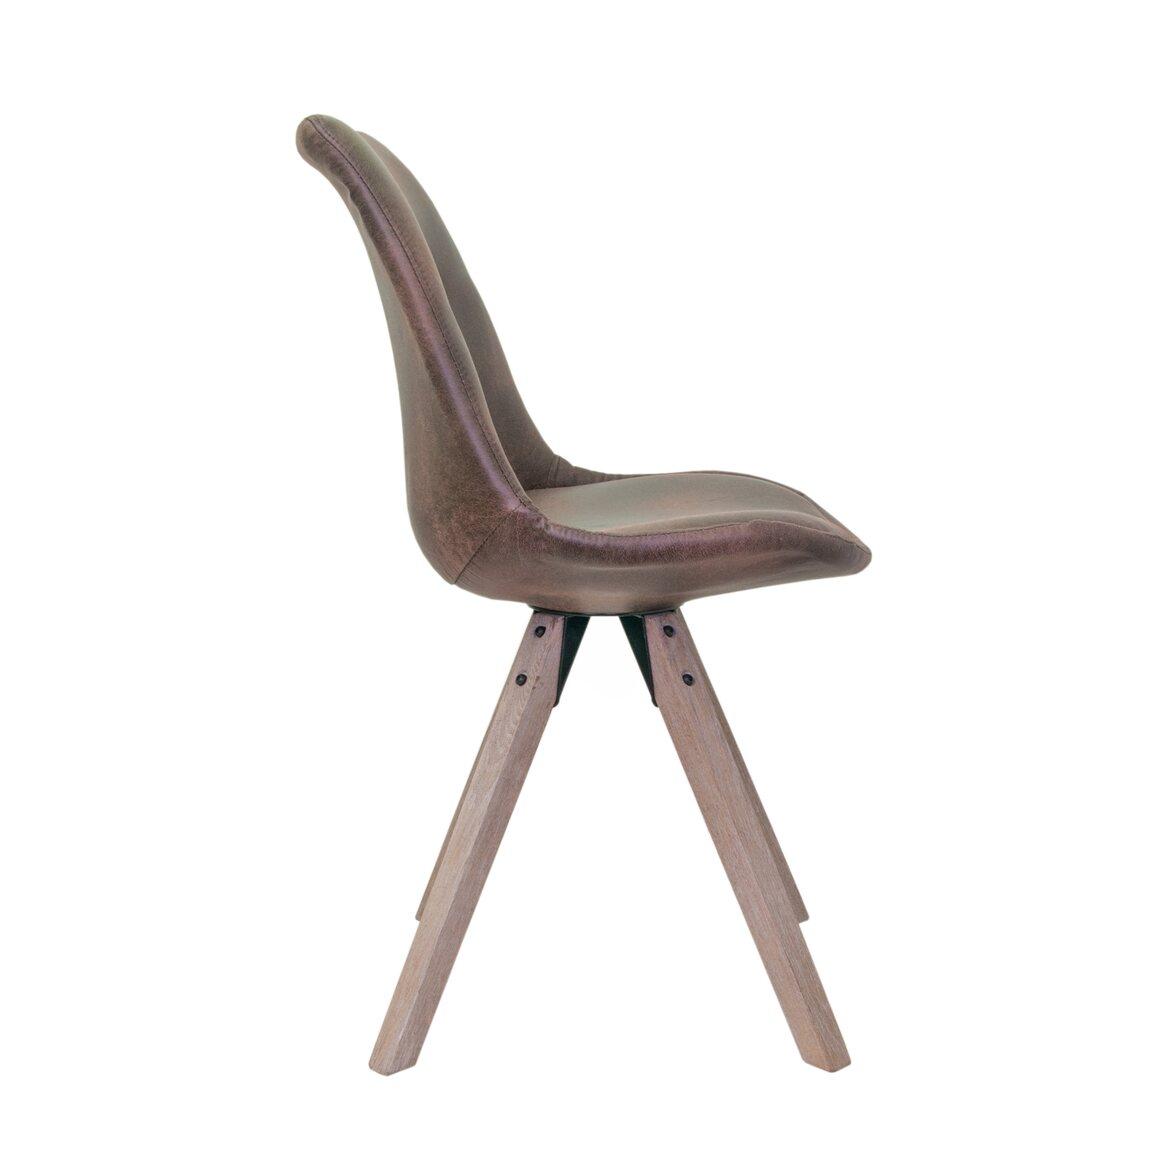 Стул Dexx brown 2 | Обеденные стулья Kingsby